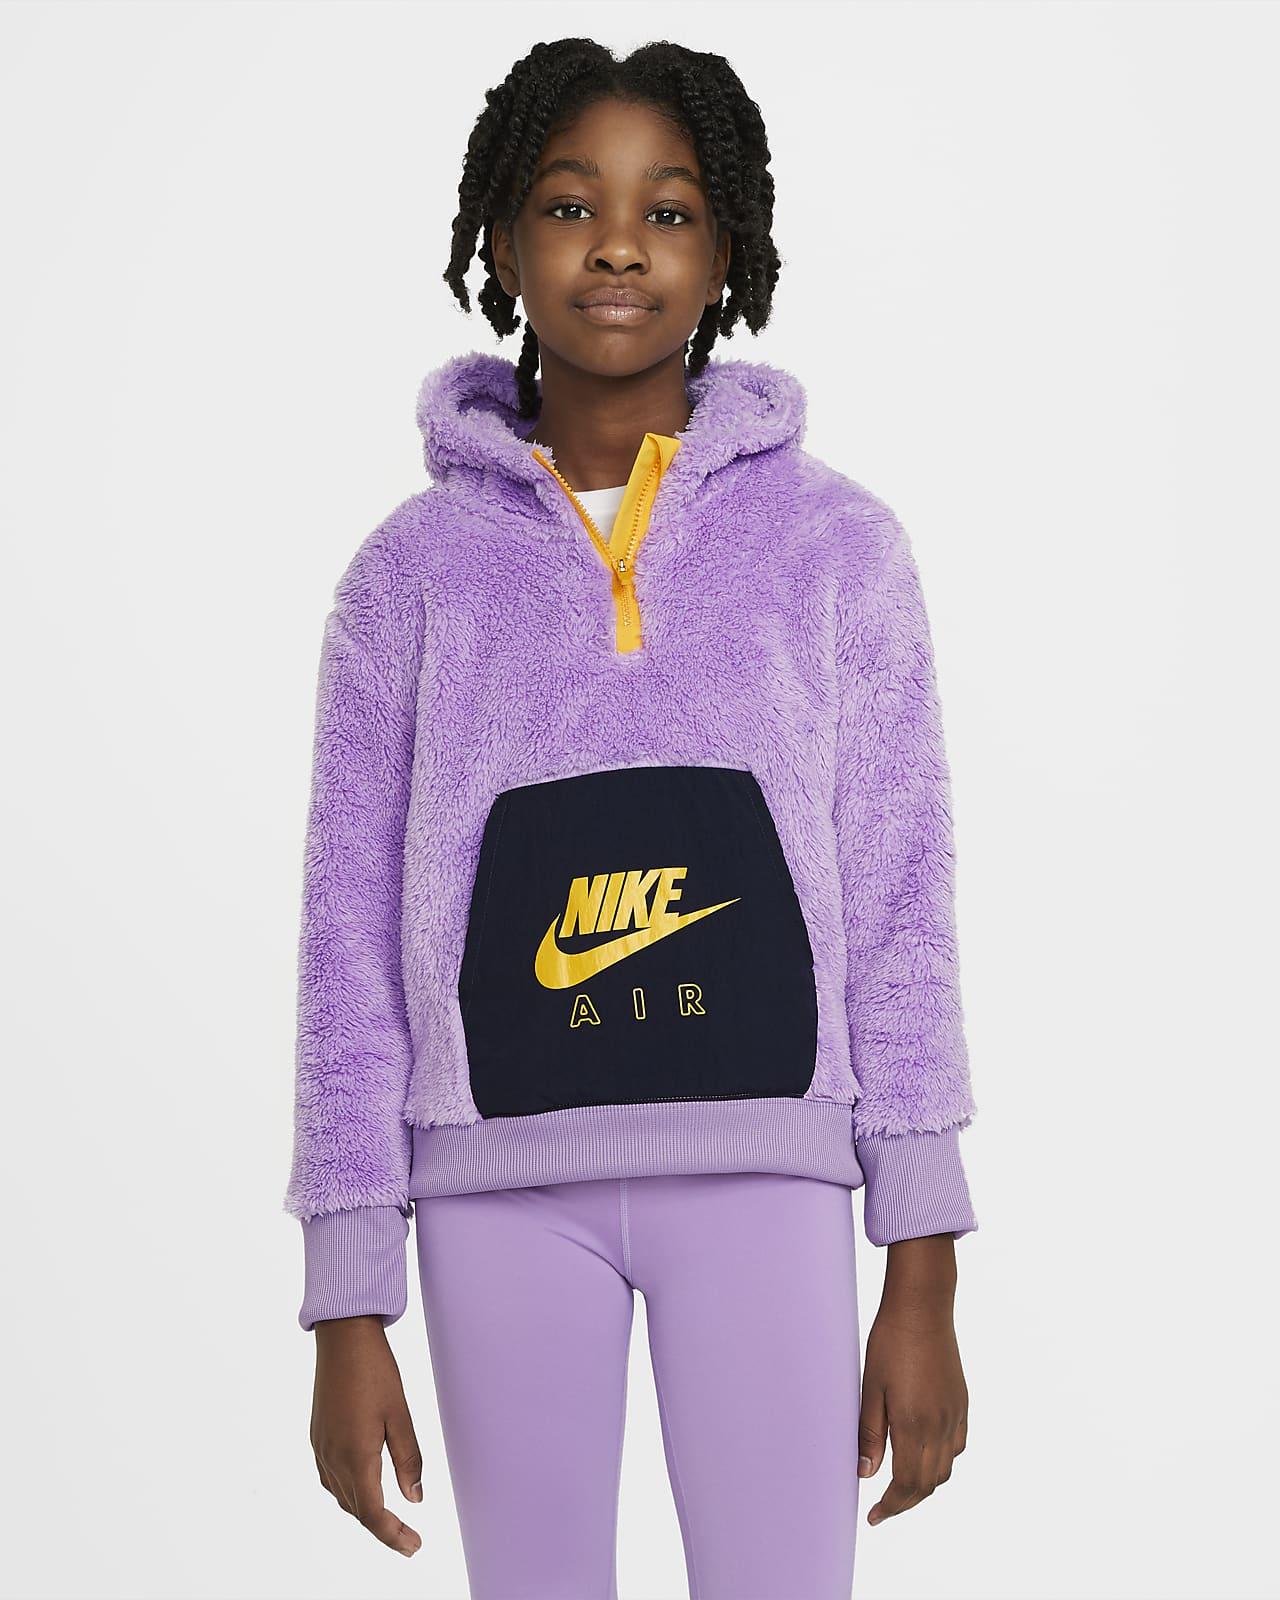 Nike Air Sudadera con capucha de tejido Sherpa - Niña